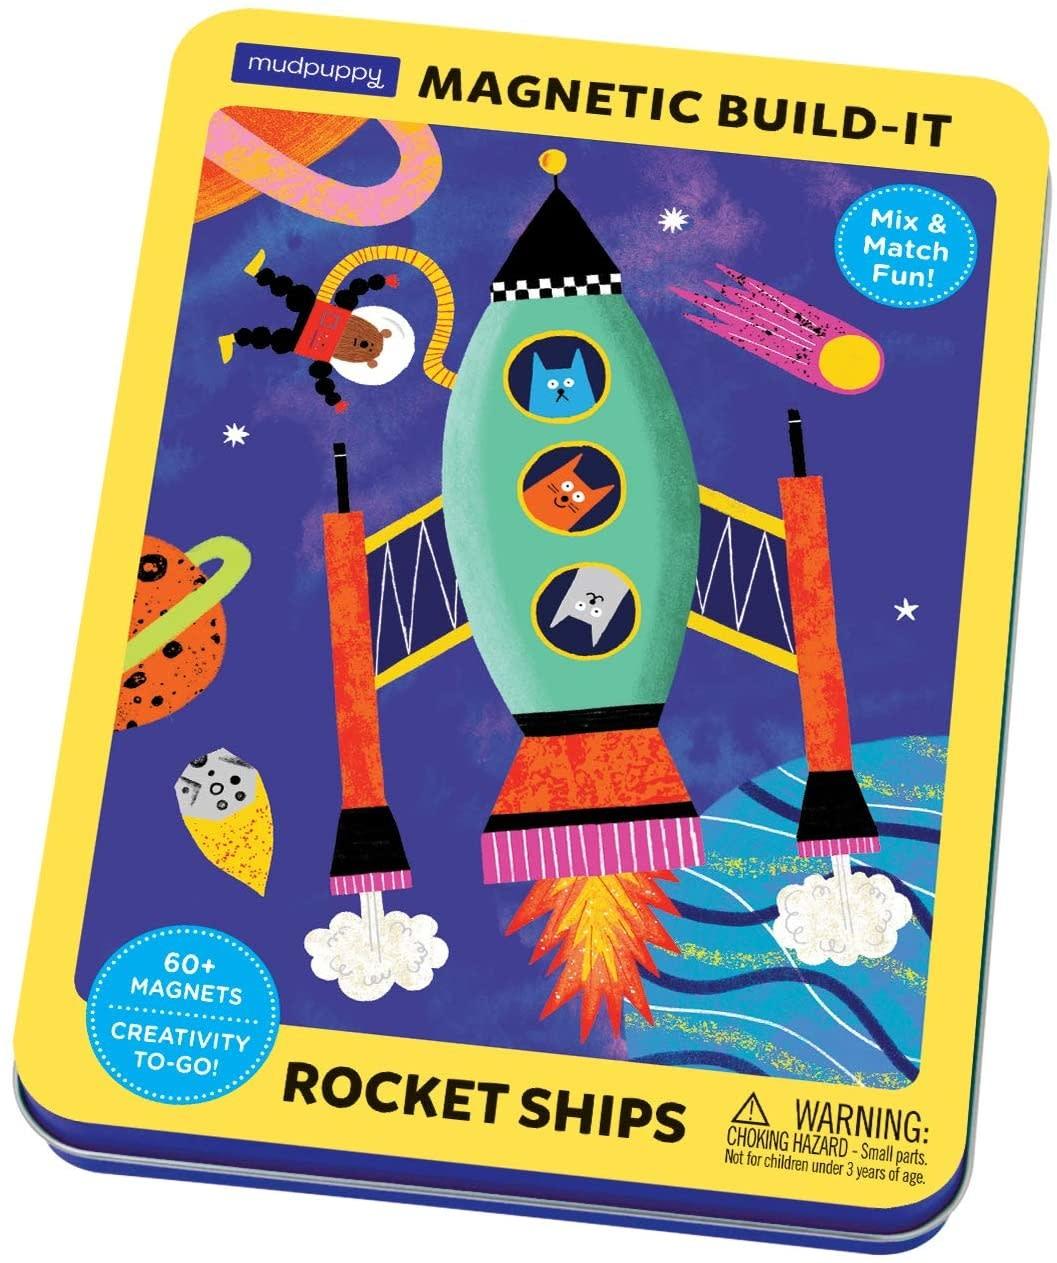 magnetic rocket ships build it-1